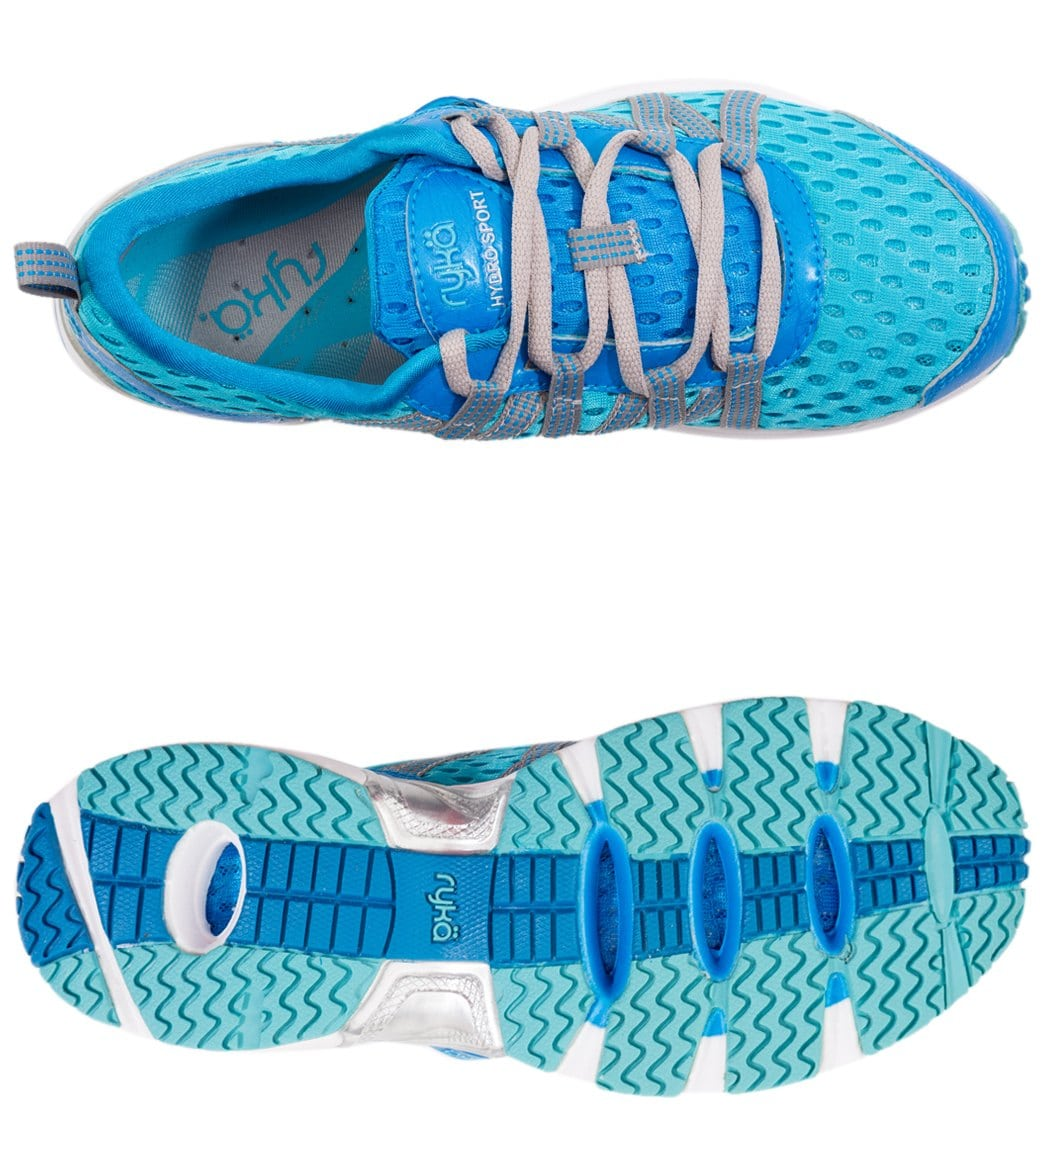 bfaa280b1184 Ryka Women s Hydro Sport Water Shoes at SwimOutlet.com - Free Shipping